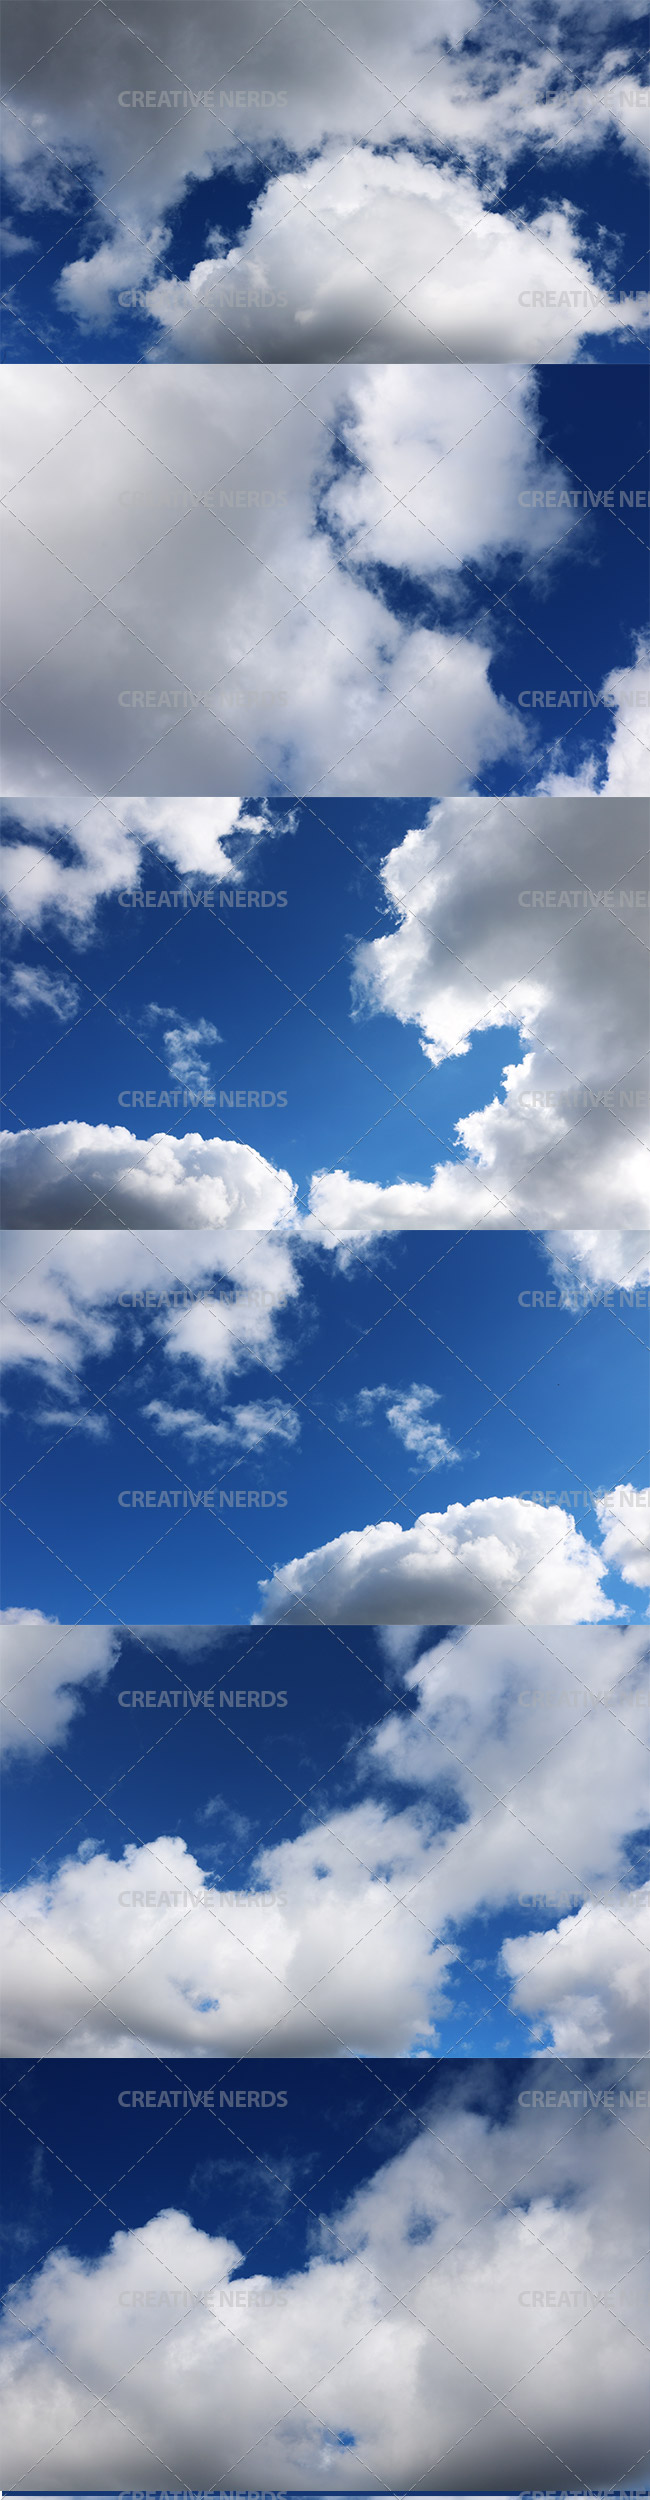 cloud textures 10 hi resolution cloud texture set